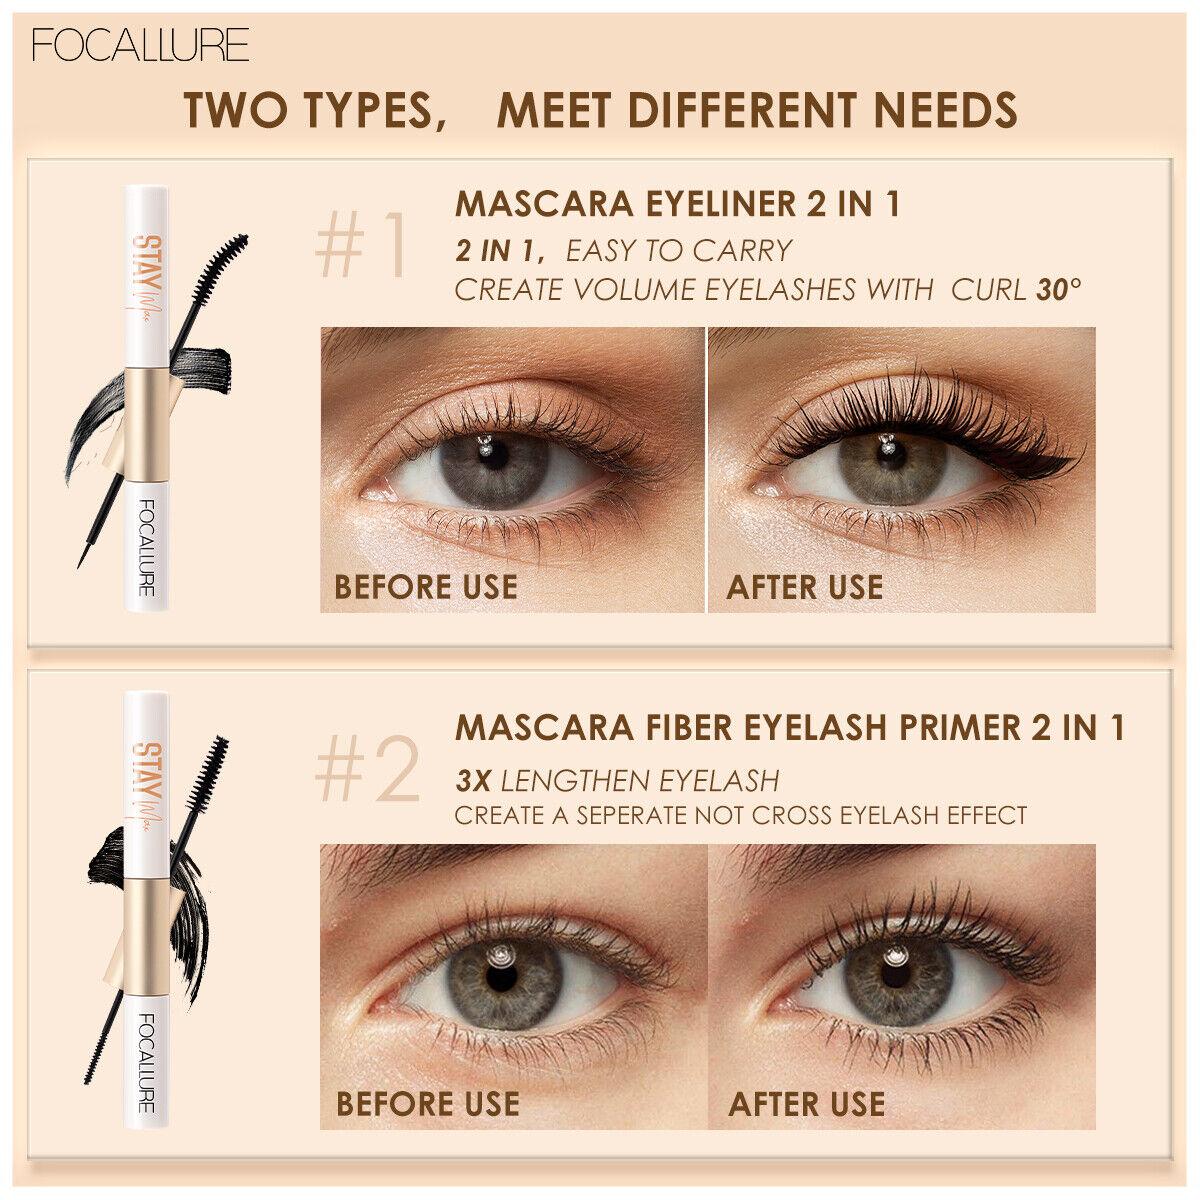 FOCALLURE, Stay Max Mascara Eyeliner 2 In 1 - $8.90